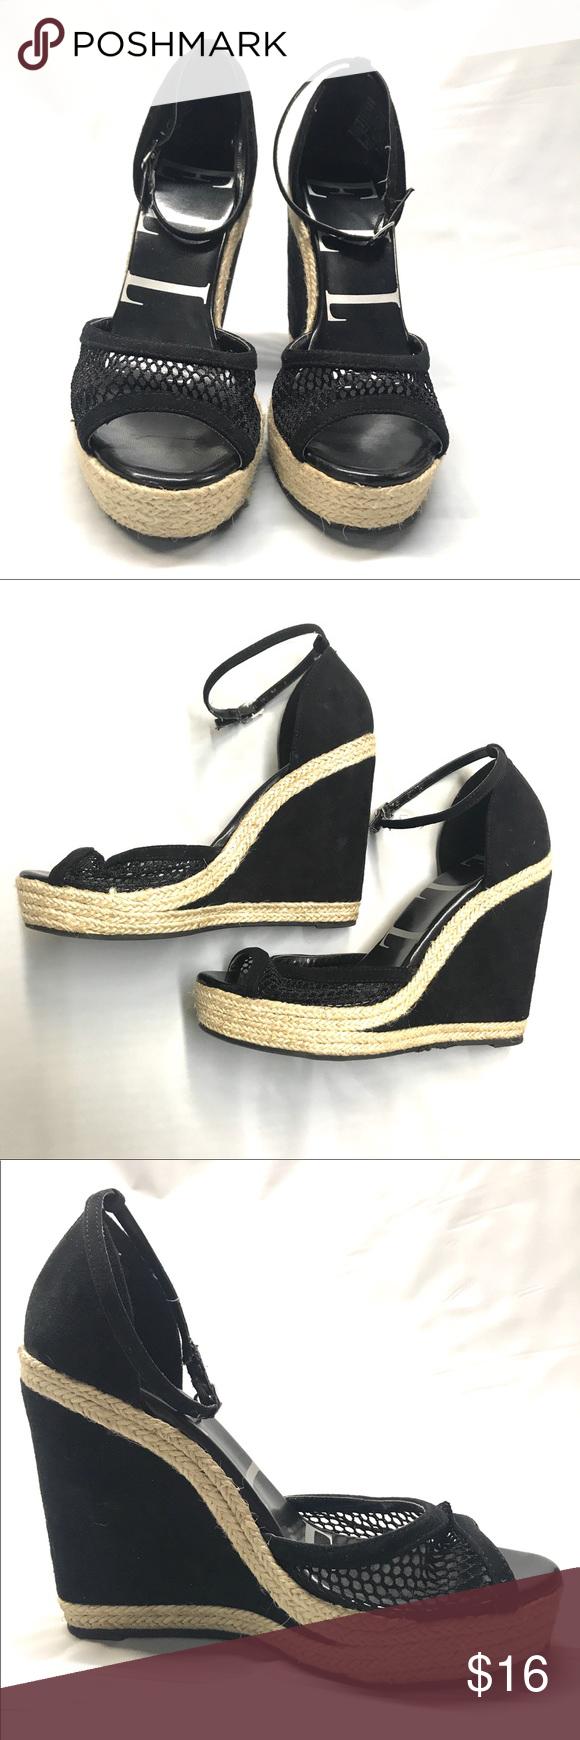 Sexy elle shoes